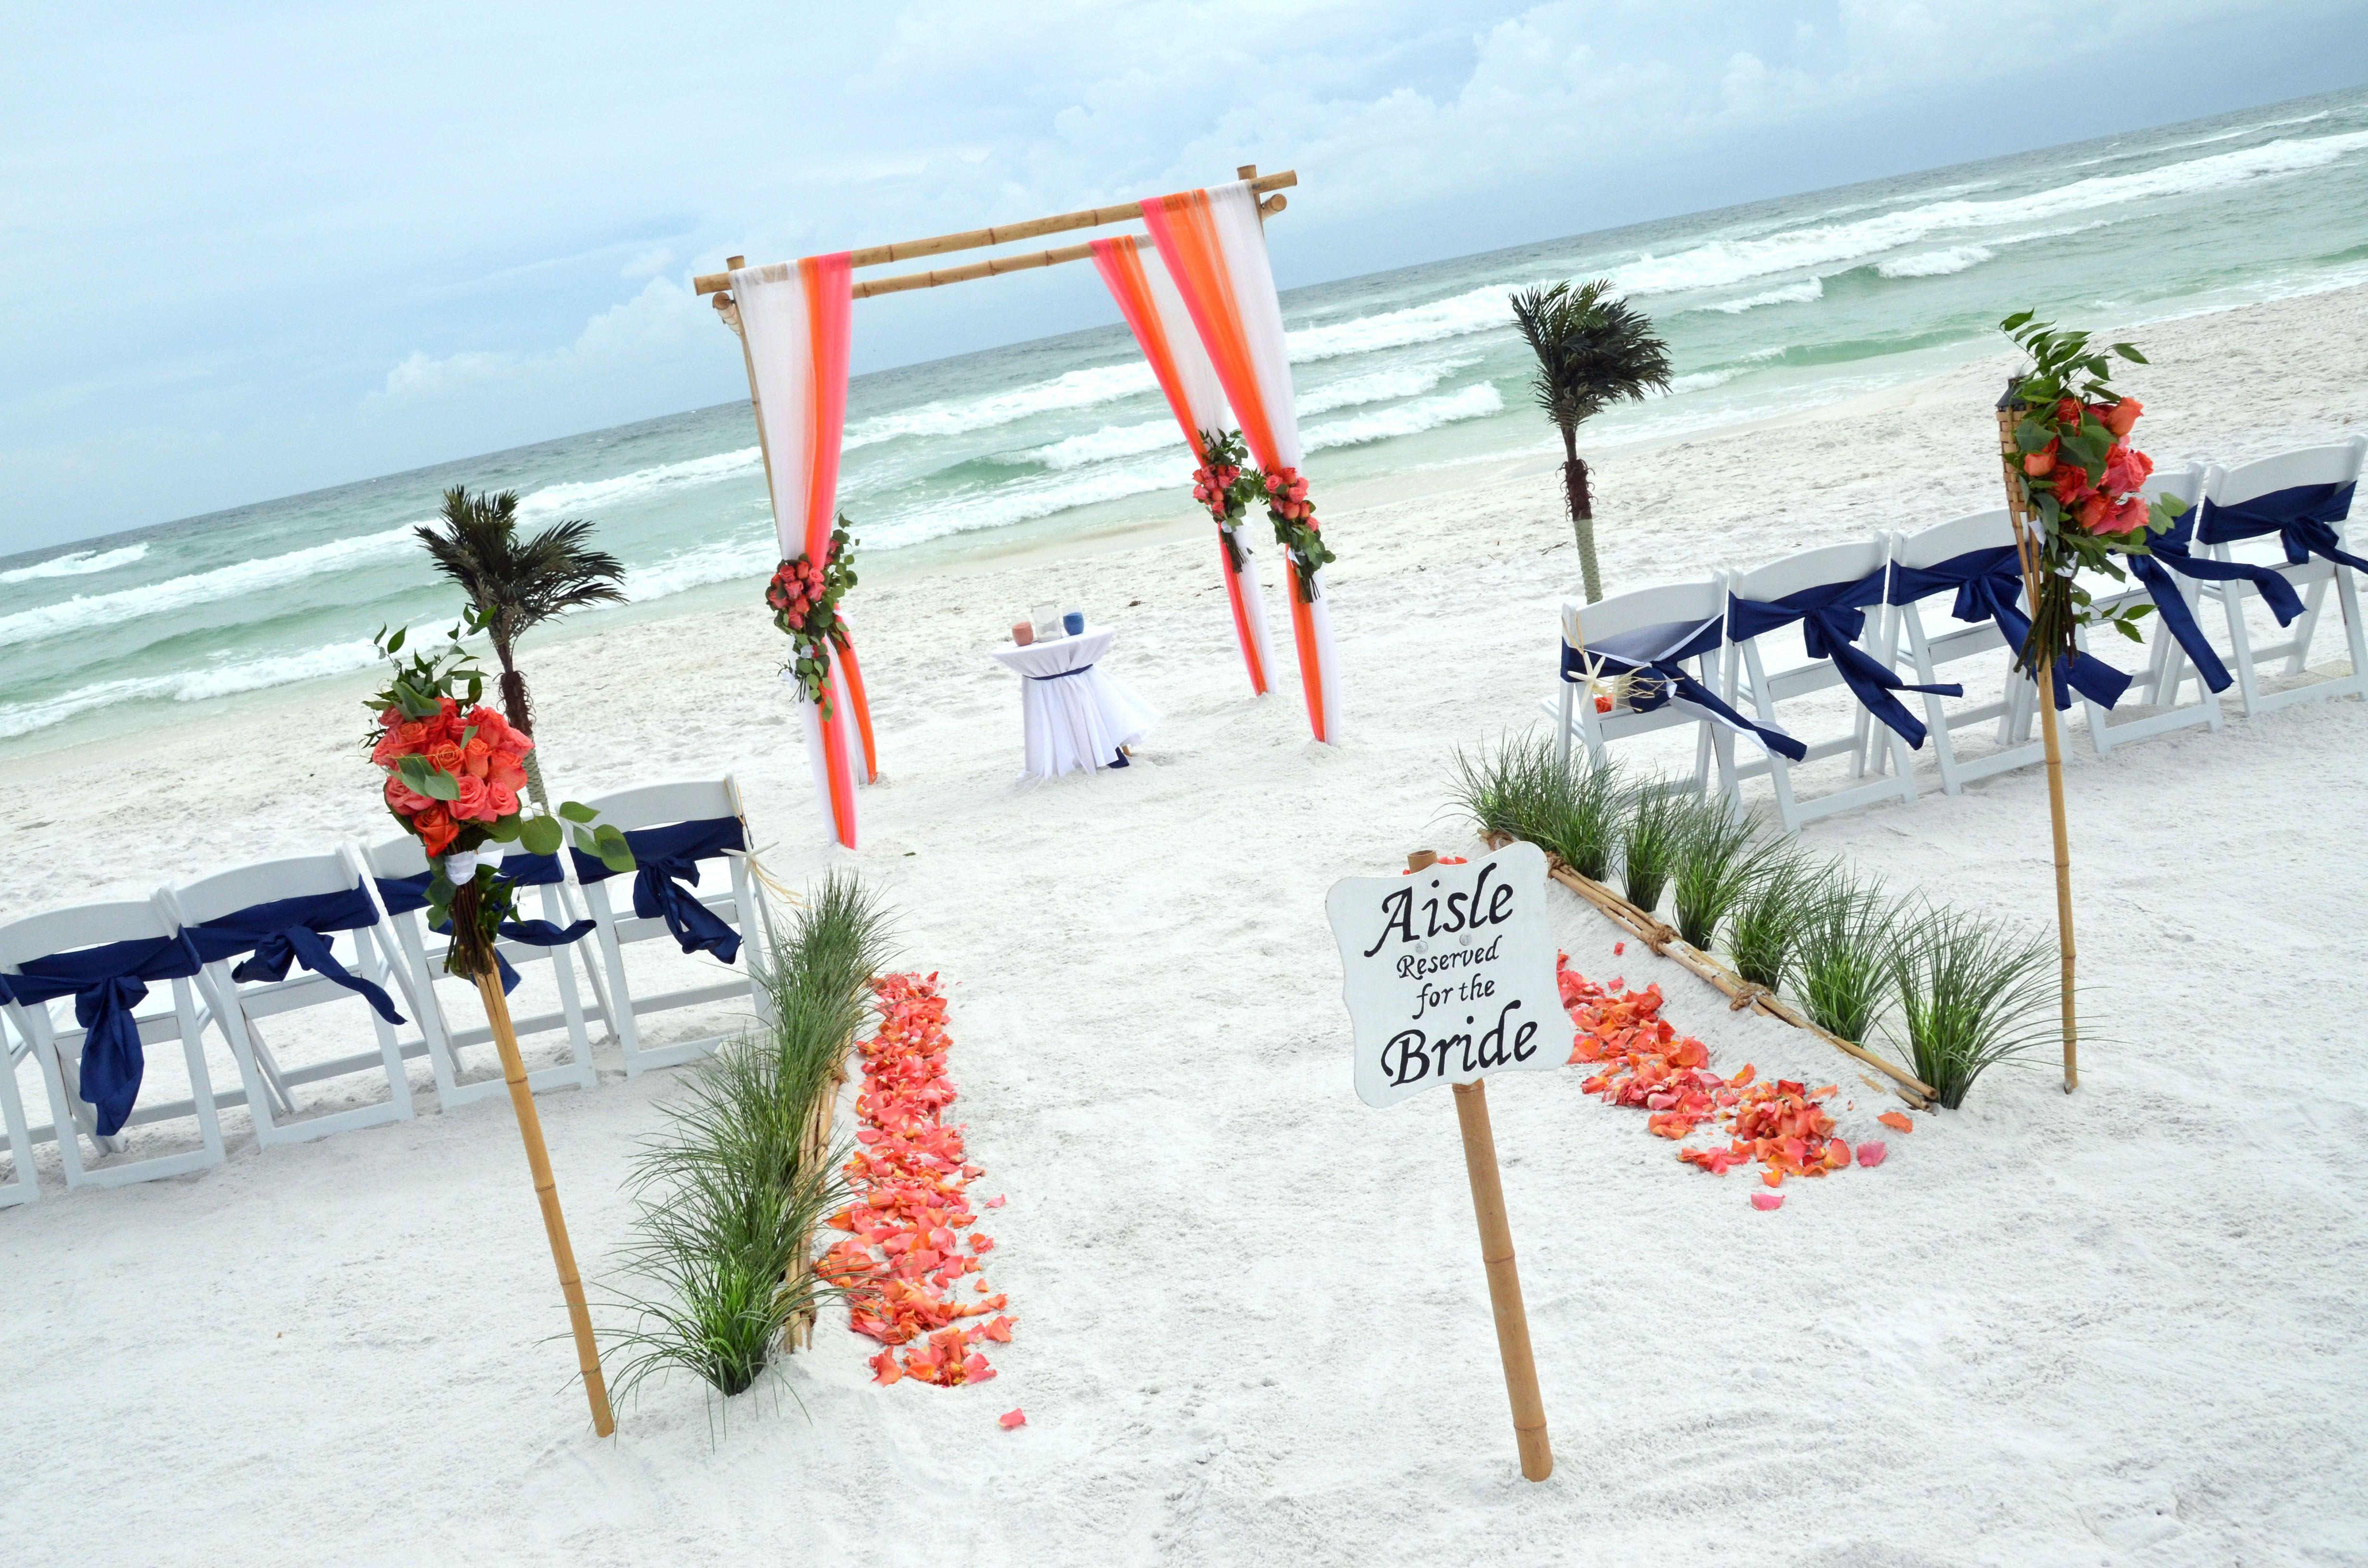 Florida Beach Wedding in 2020 Sunset beach weddings